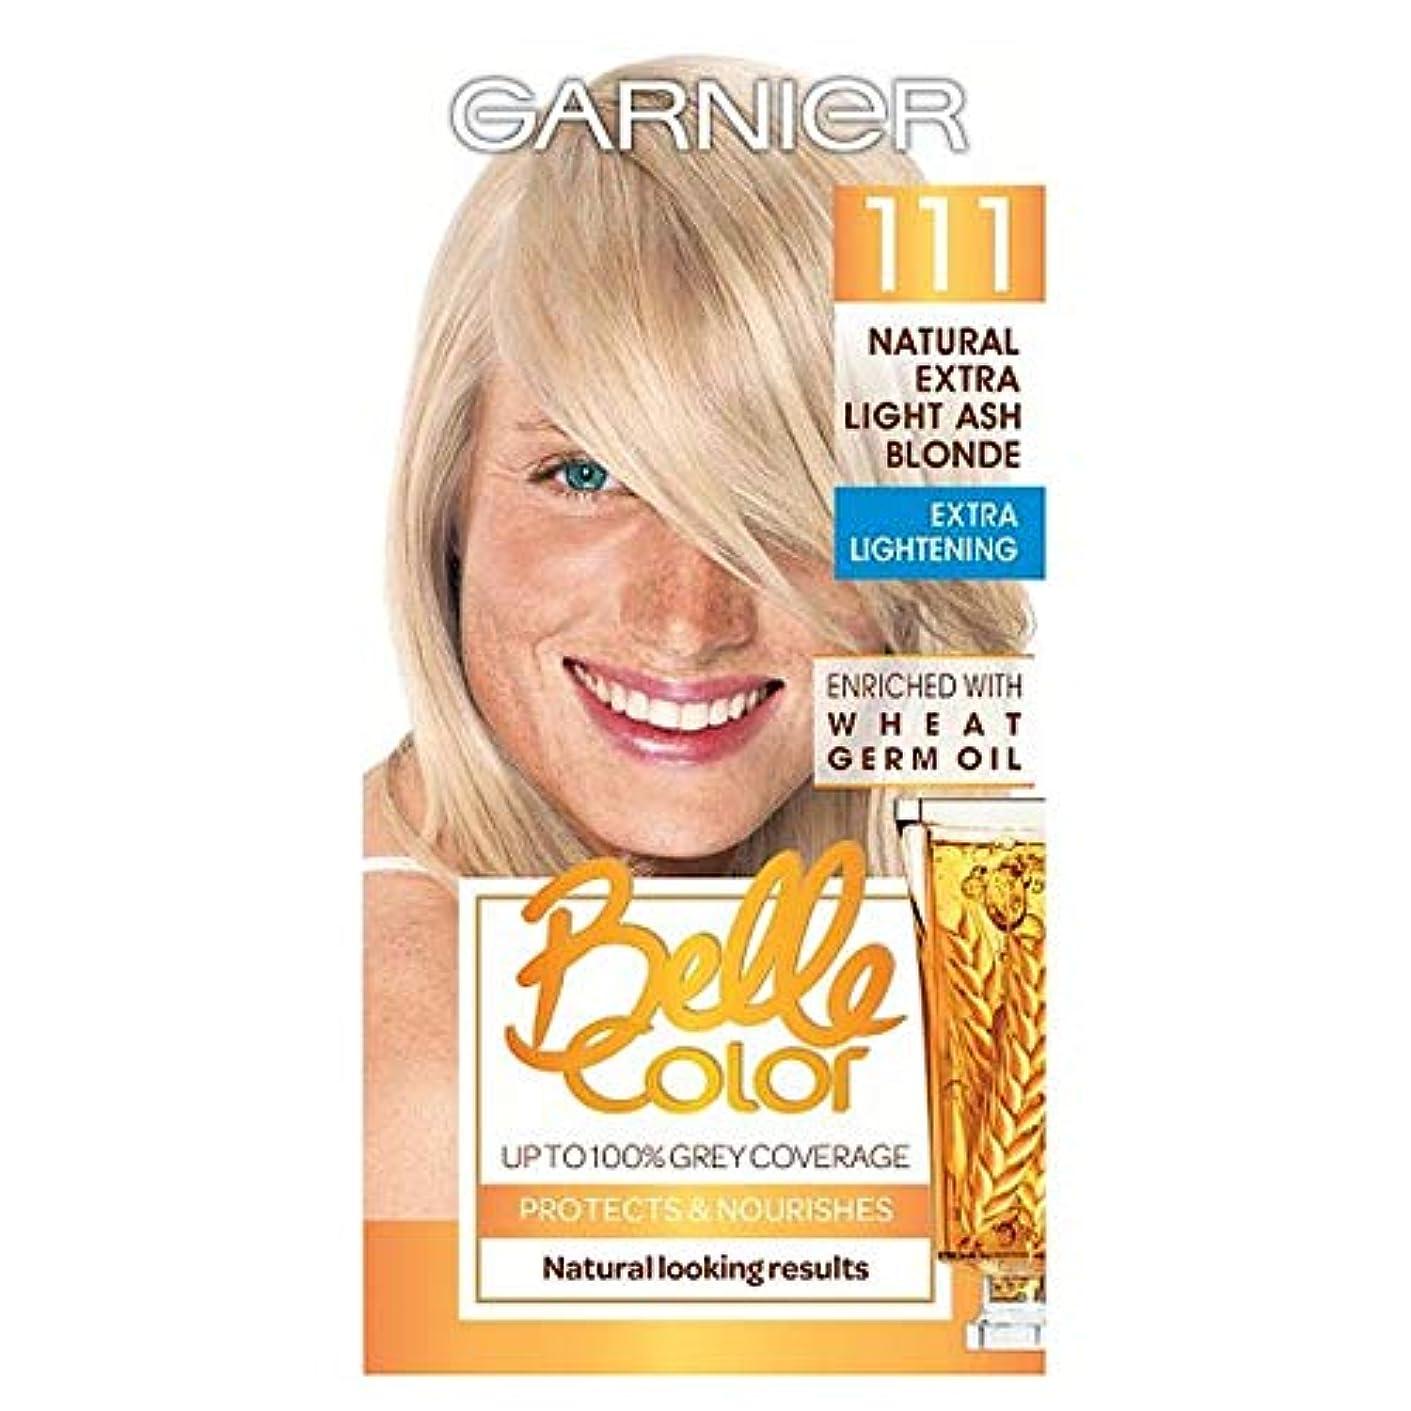 [Belle Color ] ガーン/ベル/Clr 111余分な光灰ブロンドパーマネントヘアダイ - Garn/Bel/Clr 111 Extra Light Ash Blonde Permanent Hair Dye...